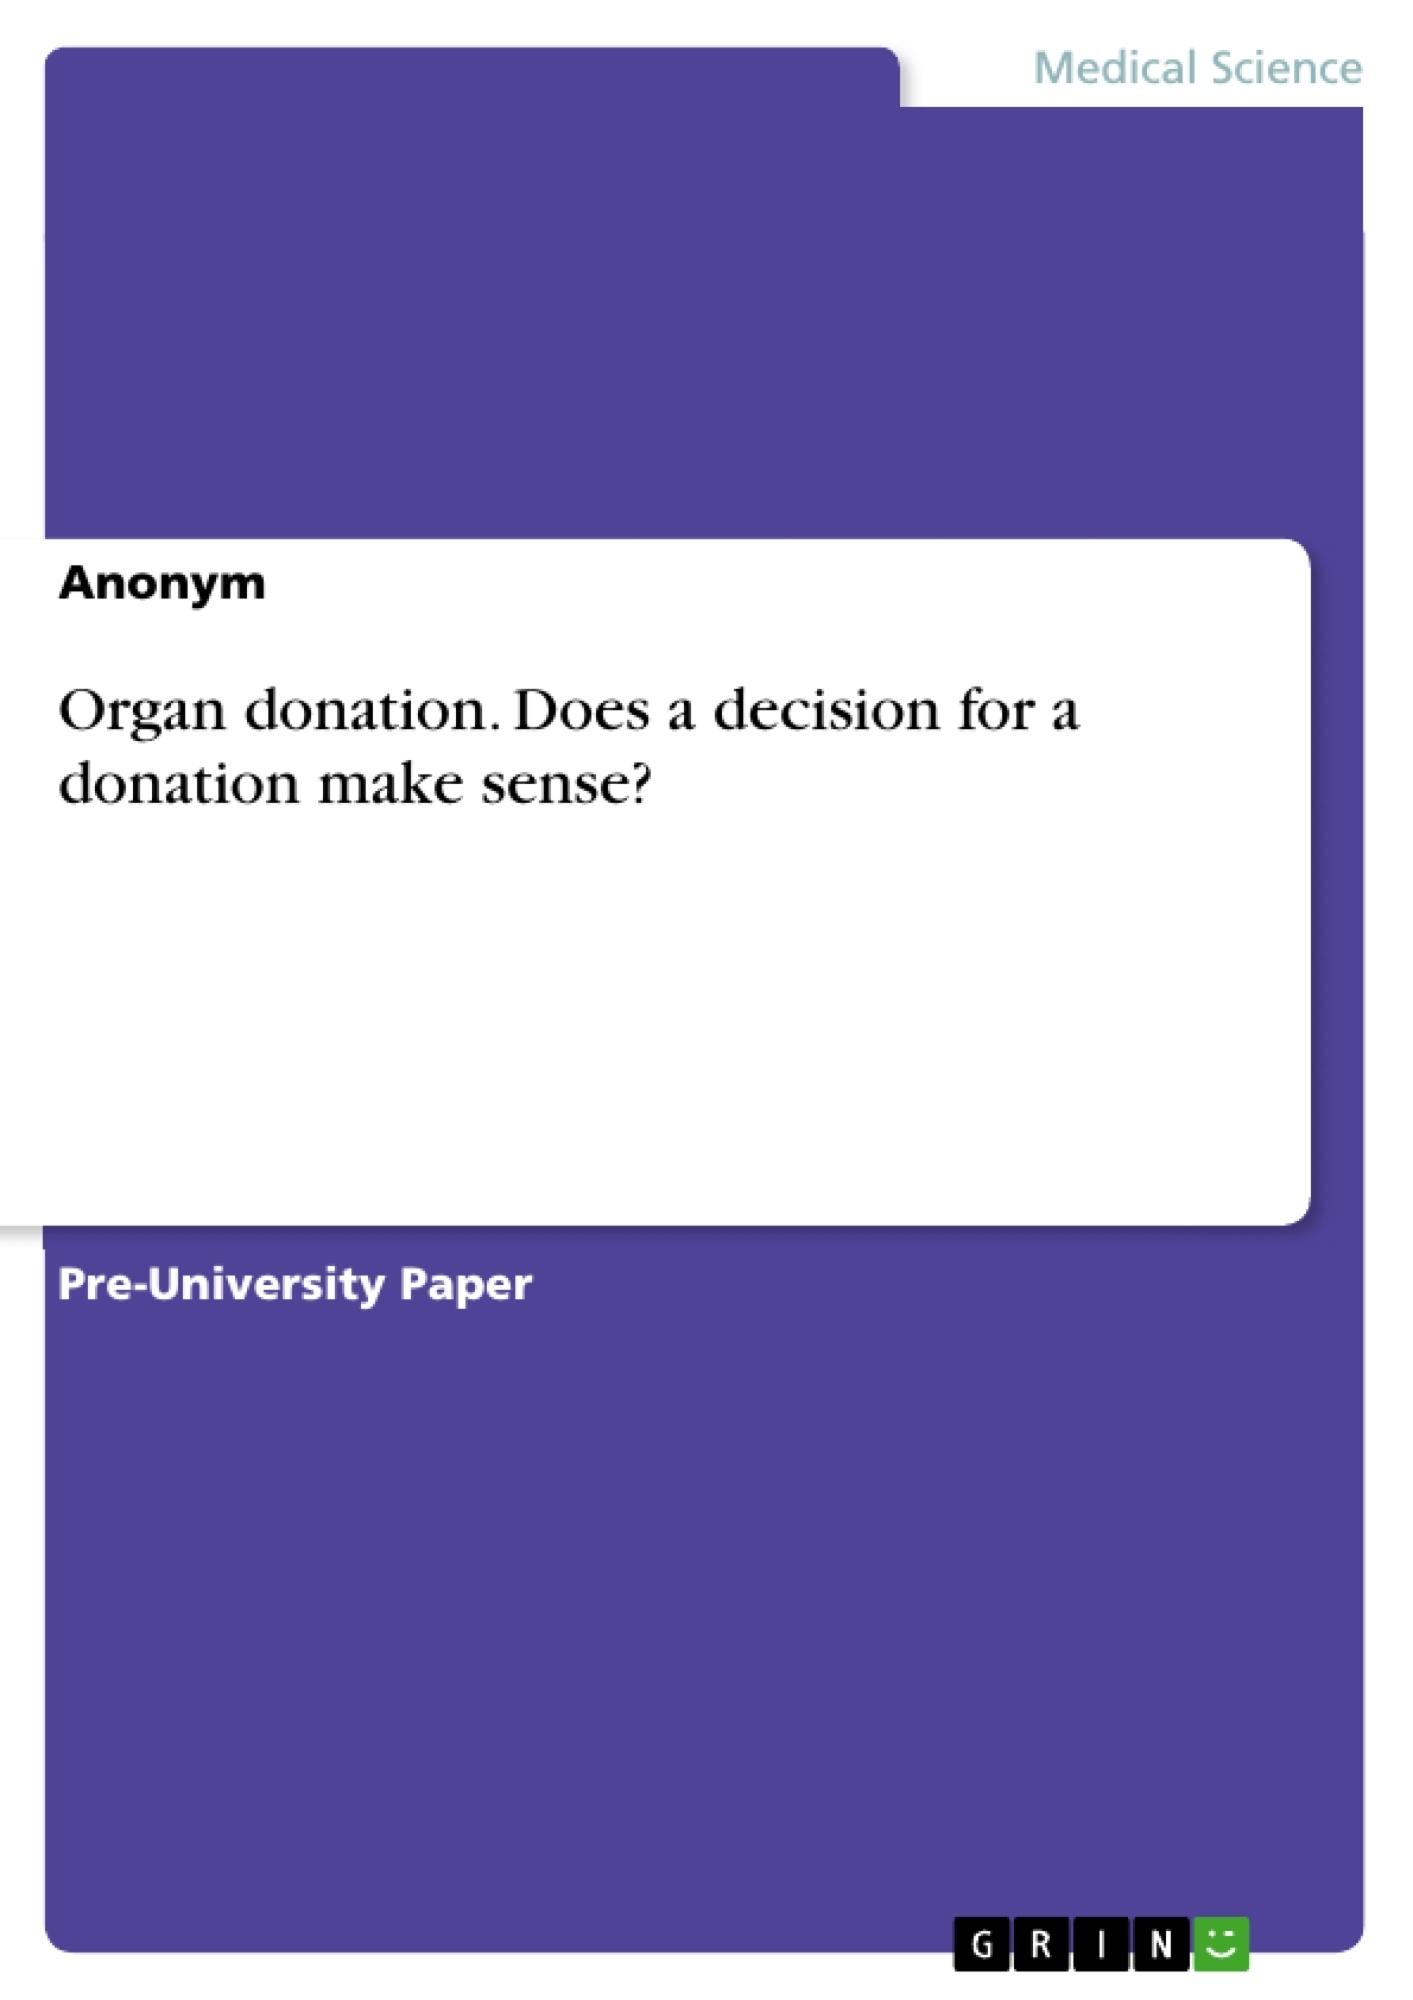 Title: Organ donation. Does a decision for a donation make sense?